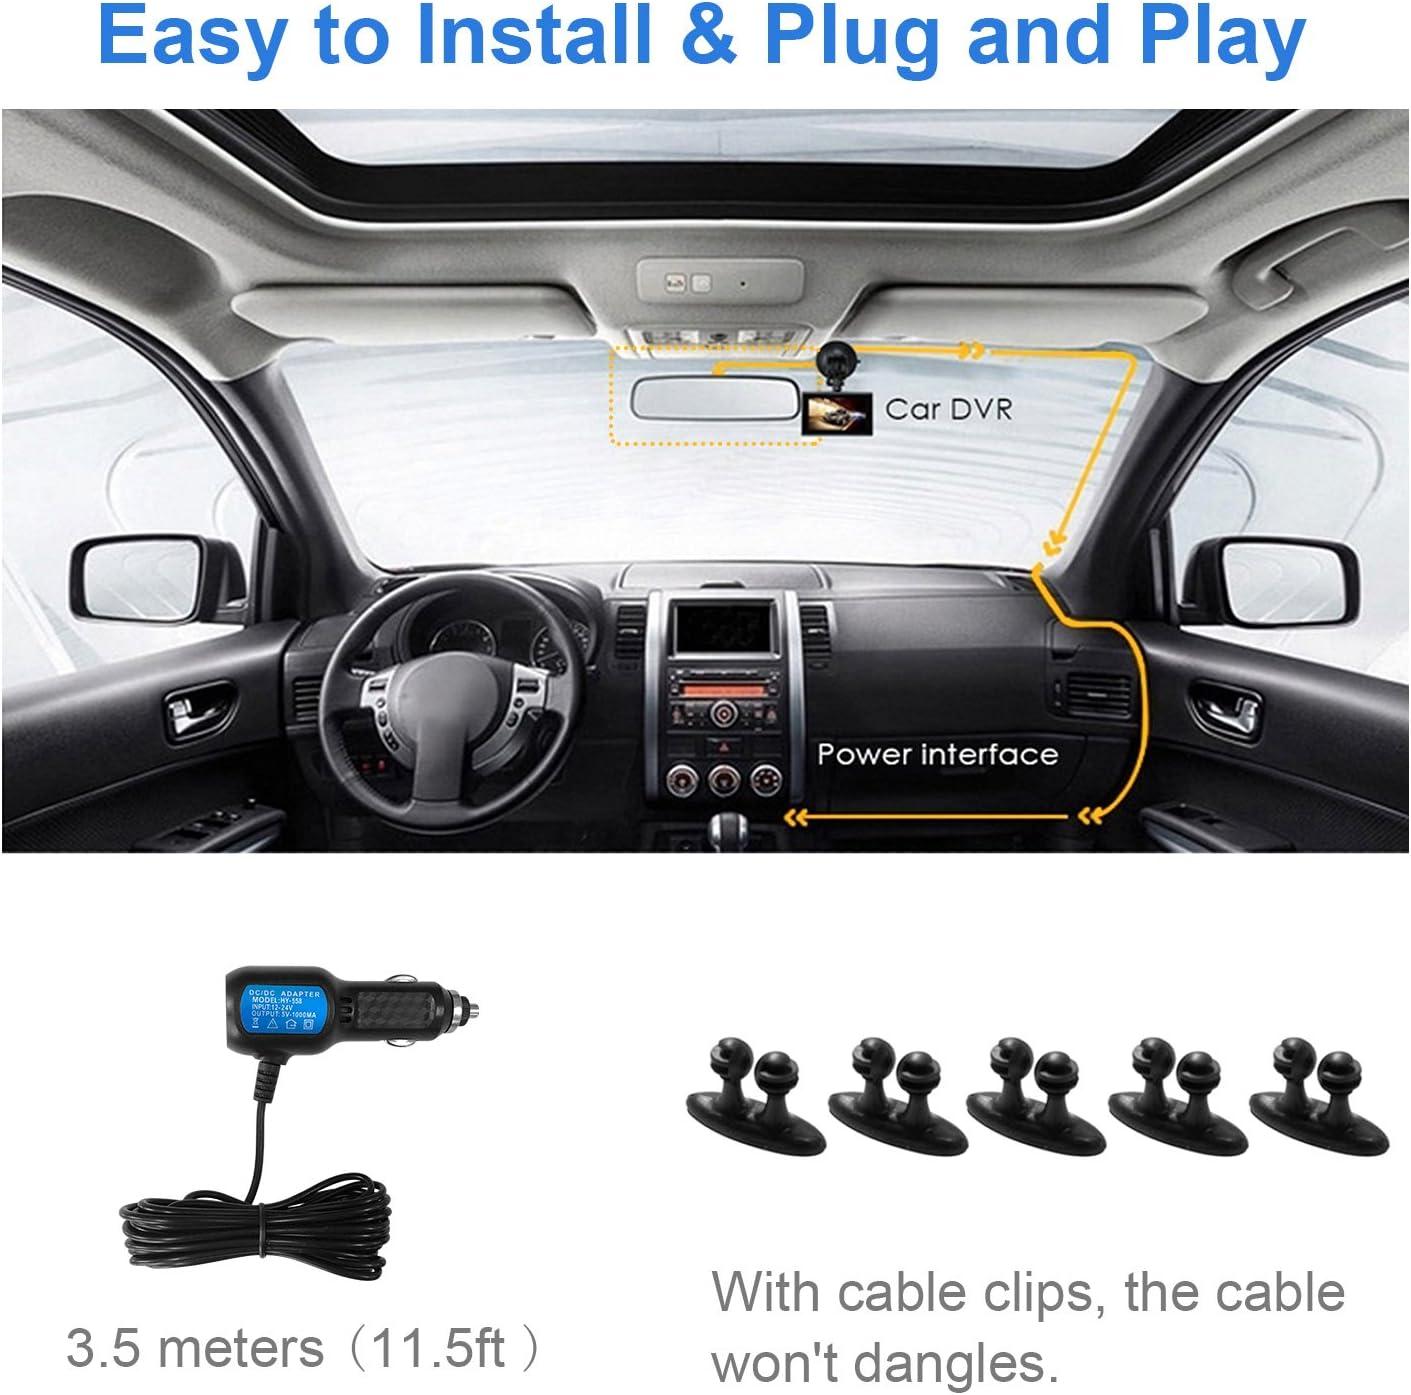 "MiniShark Dash Cam Full HD 1080P Car Blackbox Car Dash Cams DVR Dashboard Camera 3/"" LCD Screen Built In WDR G-Sensor Motion Detection Parking Monitor Loop Recorder Night Vision"